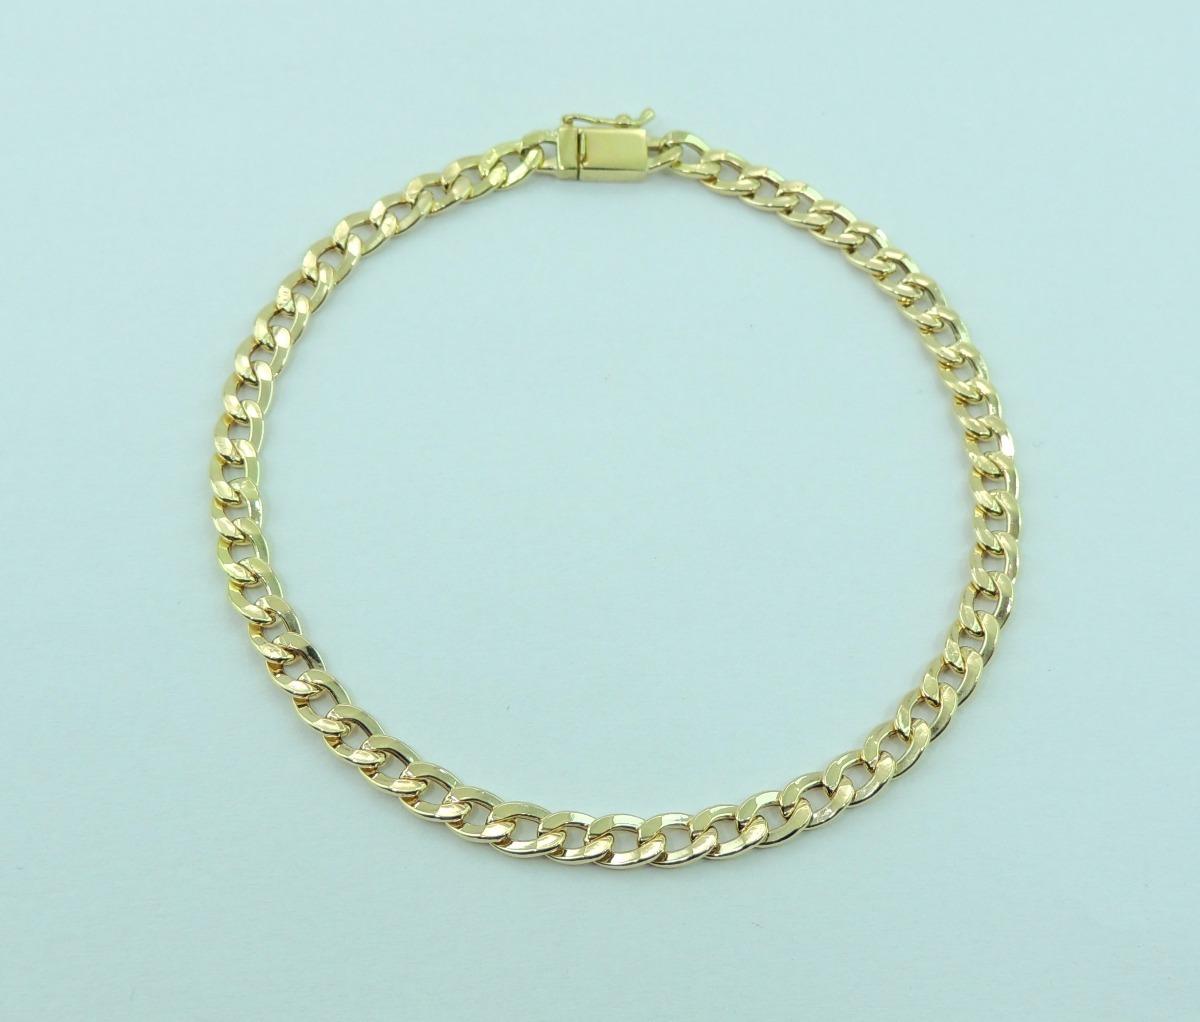 aac237169d7b7 pulseira masculina cordão grumet 18 cm fecho gaveta ouro 18k. Carregando  zoom.